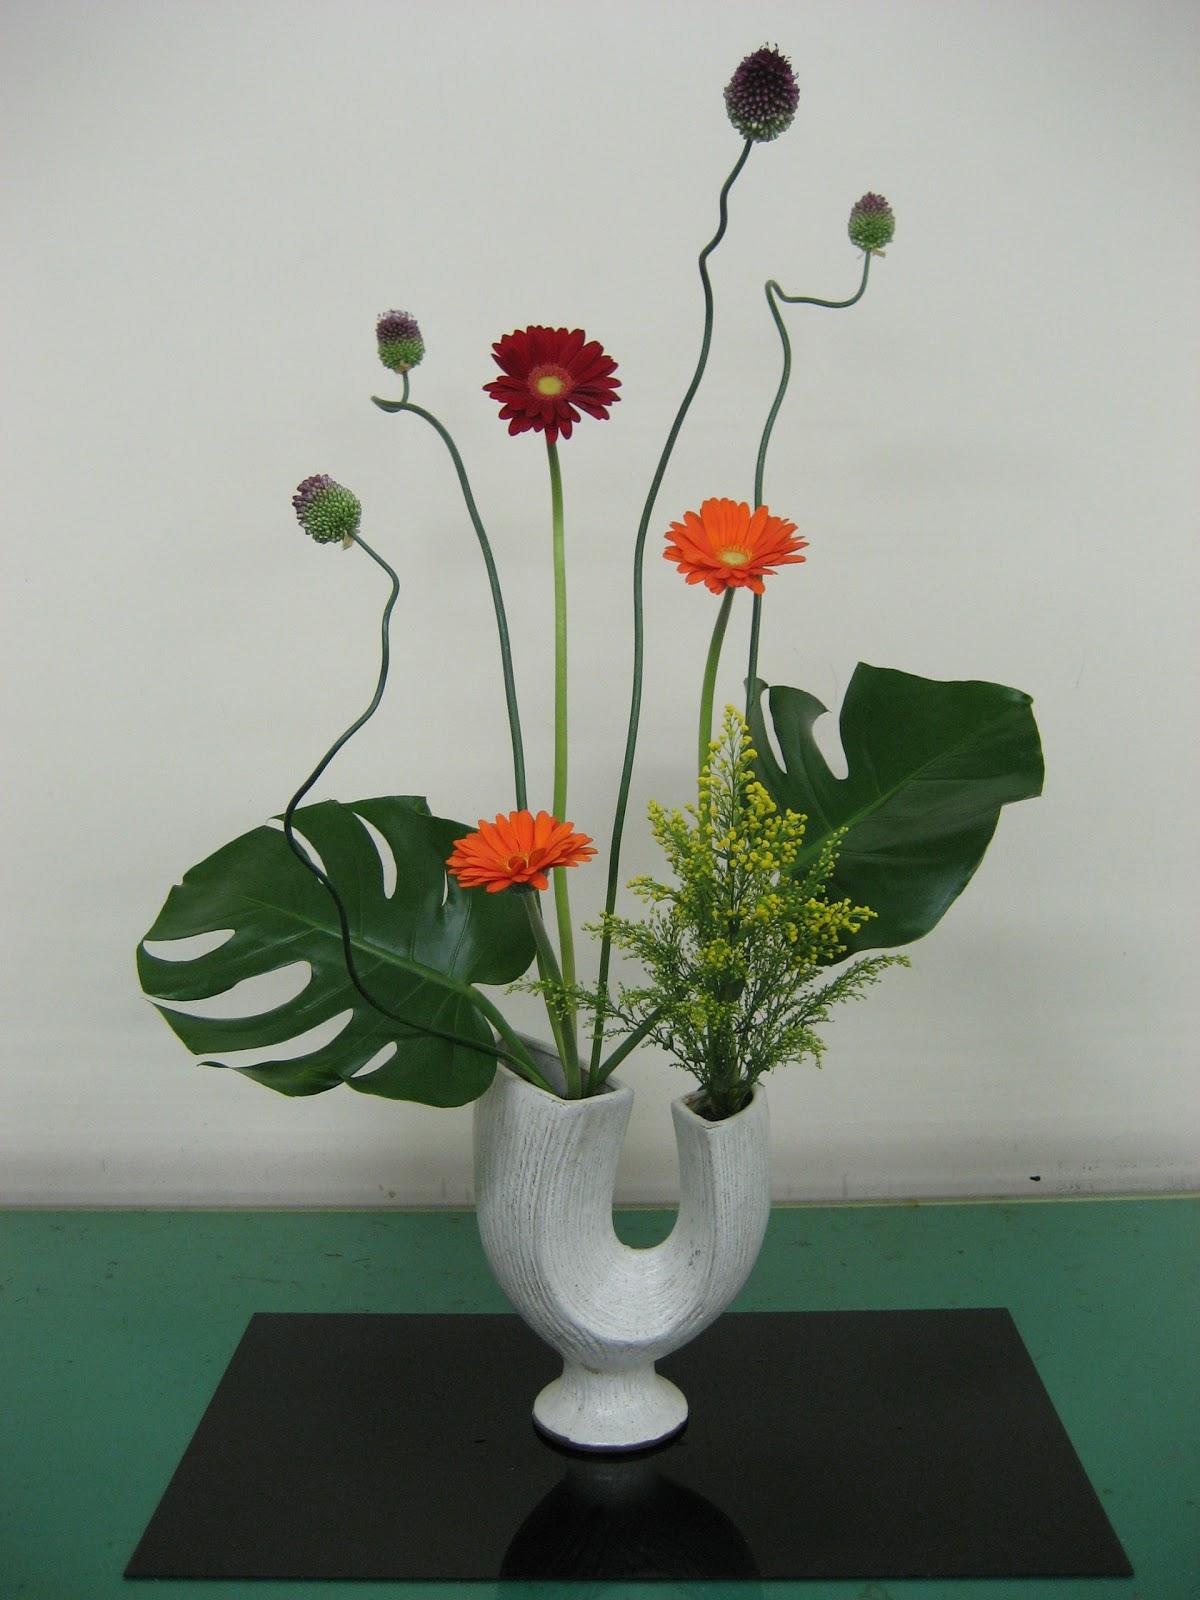 Katerina Lanfranco: Ikebana - Sculpting with Flowers Asian Flower Arrangements